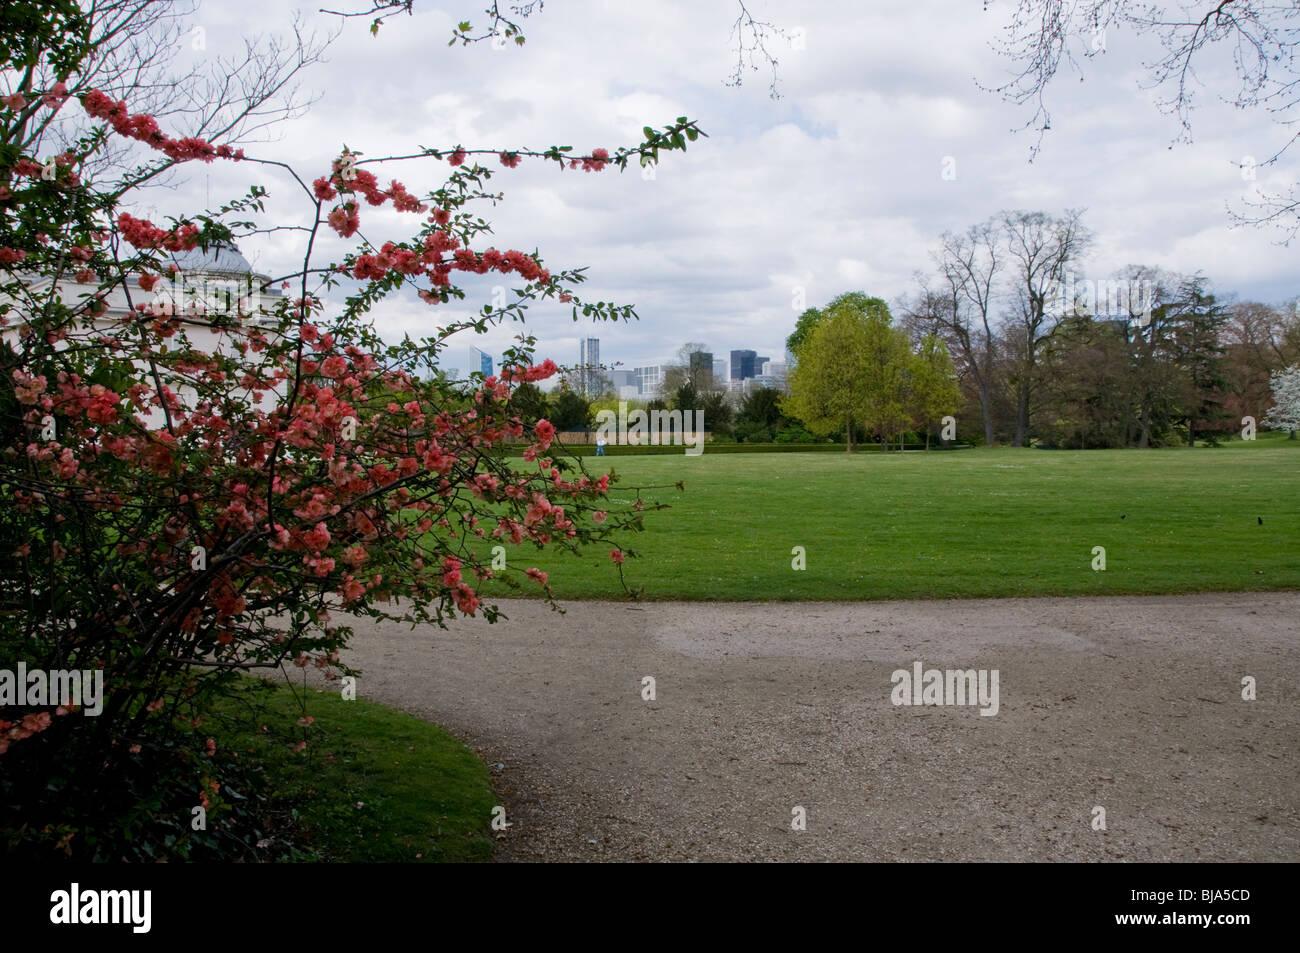 Paris, France, Urban Parks, Spring Landscape, People Visiting Bois de Boulogne Rose Garden Stock Photo